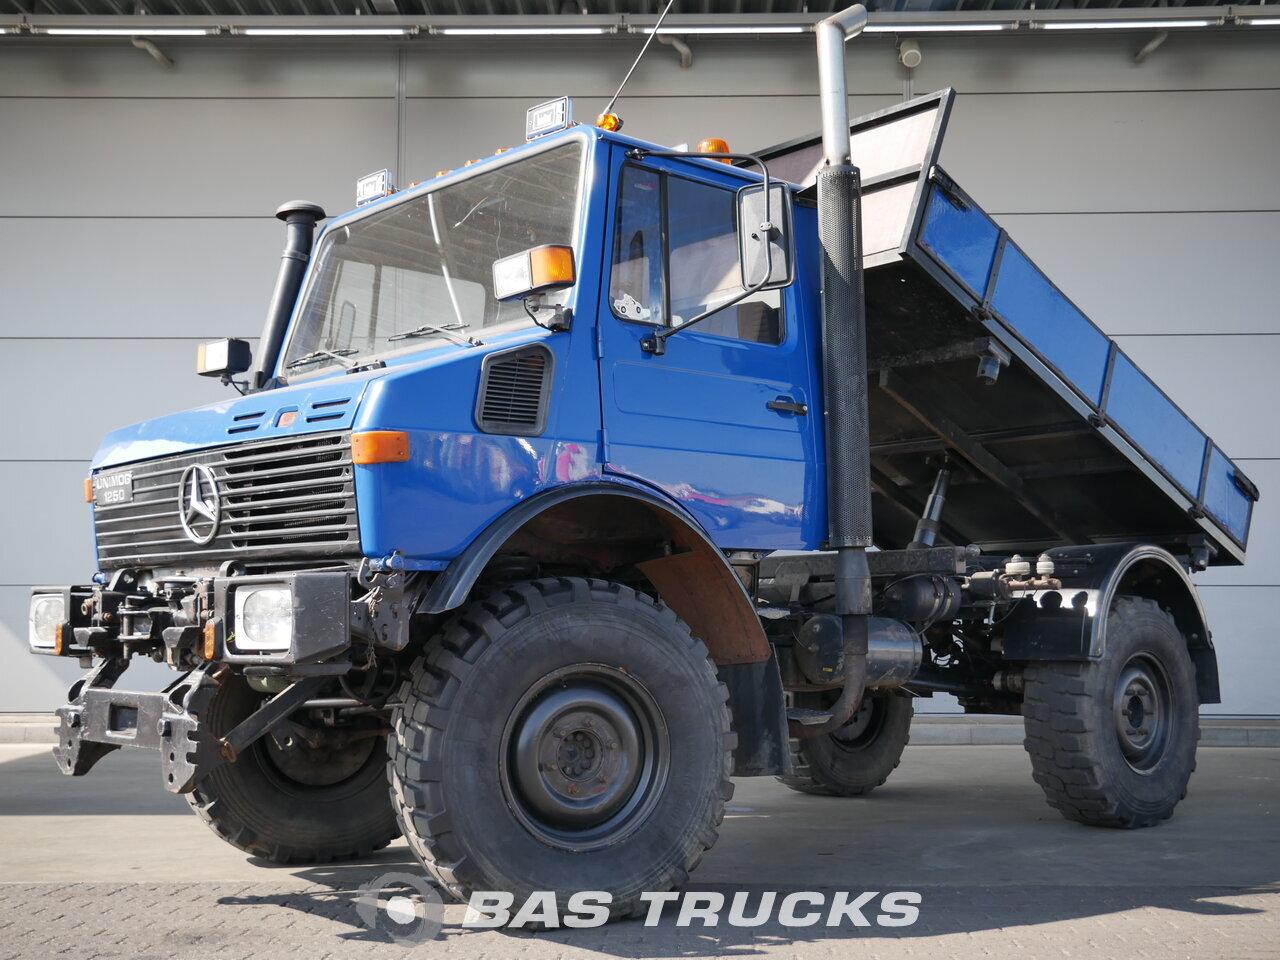 Unimog For Sale >> For Sale At Bas Trucks Mercedes Unimog U1250 4x4 09 1986